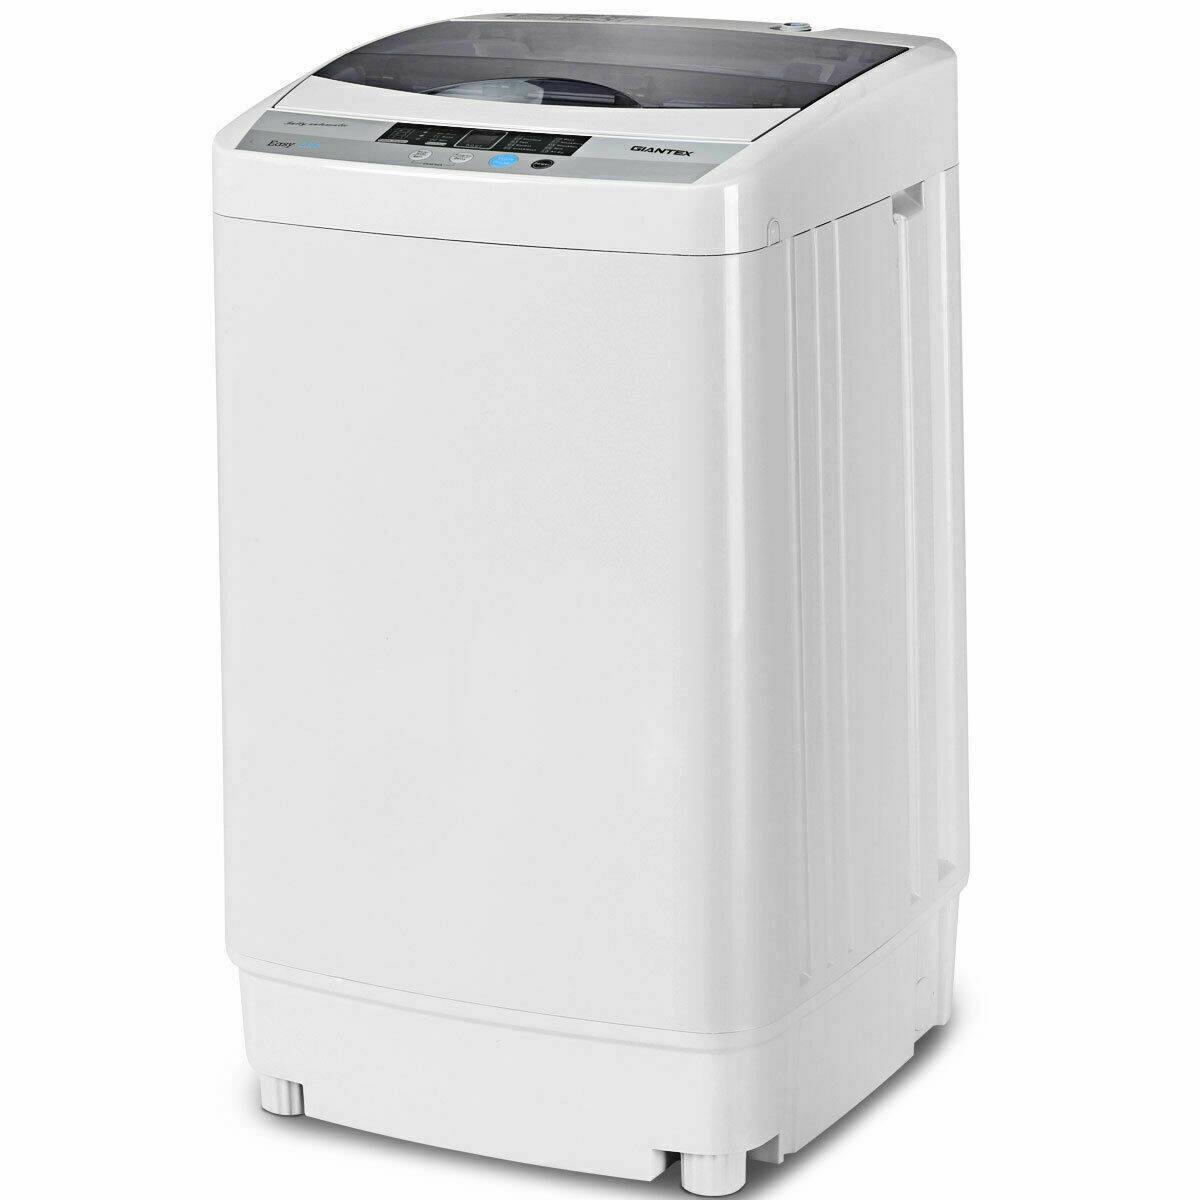 8 Water Level Portable Compact Washing Machine $279.95 + FS